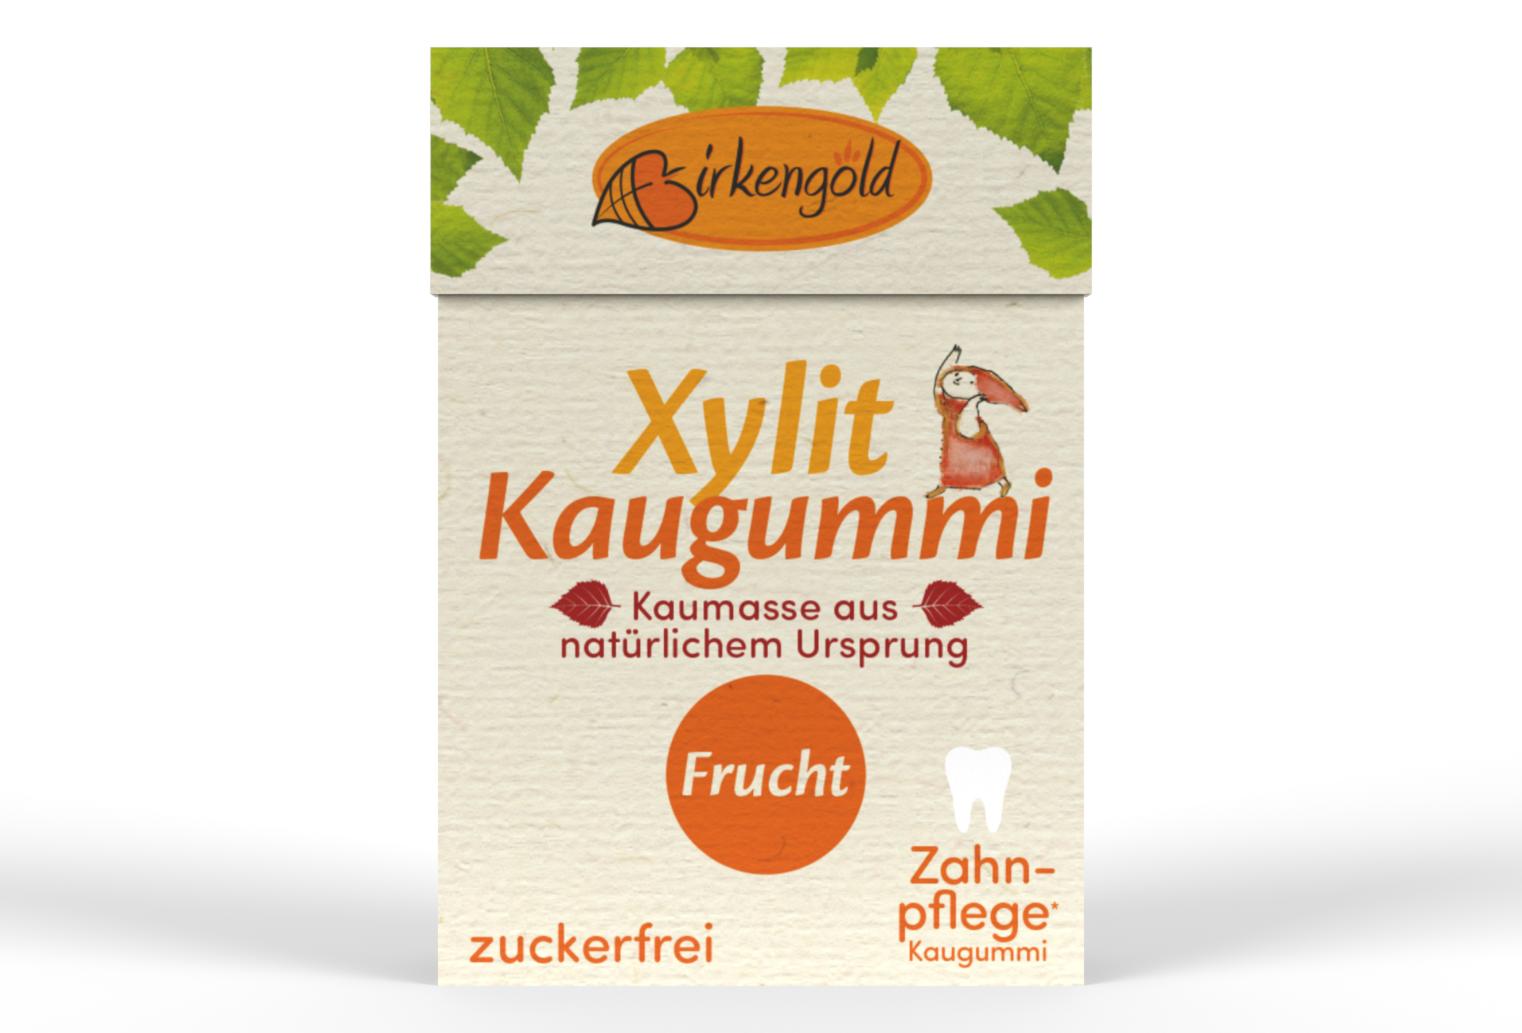 Birkengold Kaugummi Frucht nat. Kaumasse